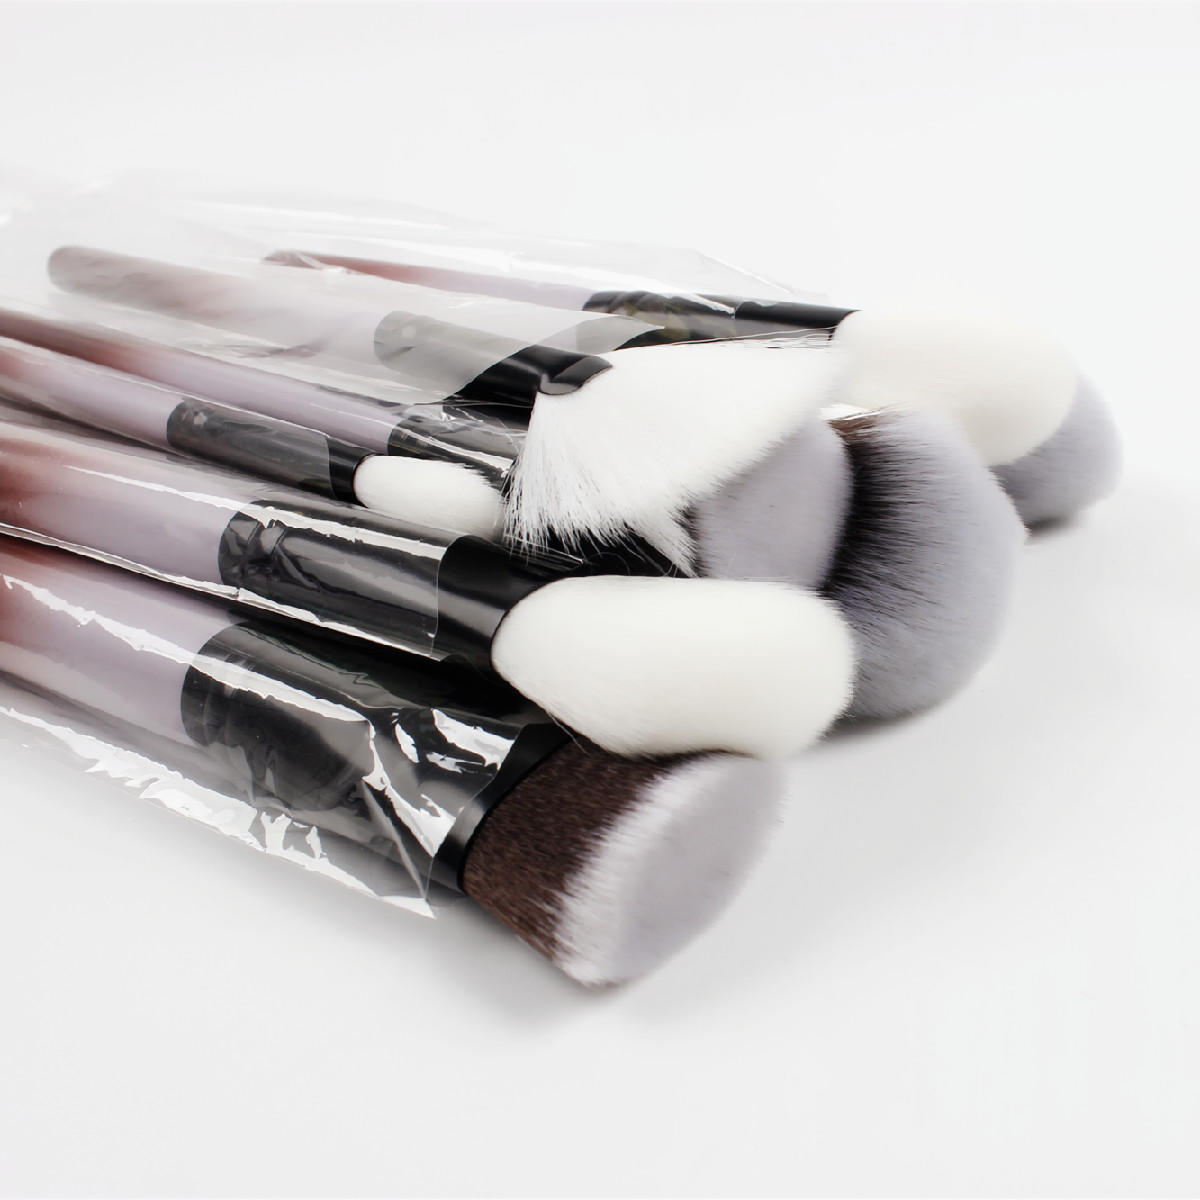 Luxury 15PCS Professional Makeup Brushes Set Kits Black Wooden Private Label Logo Custom cosmetic makeup brush set